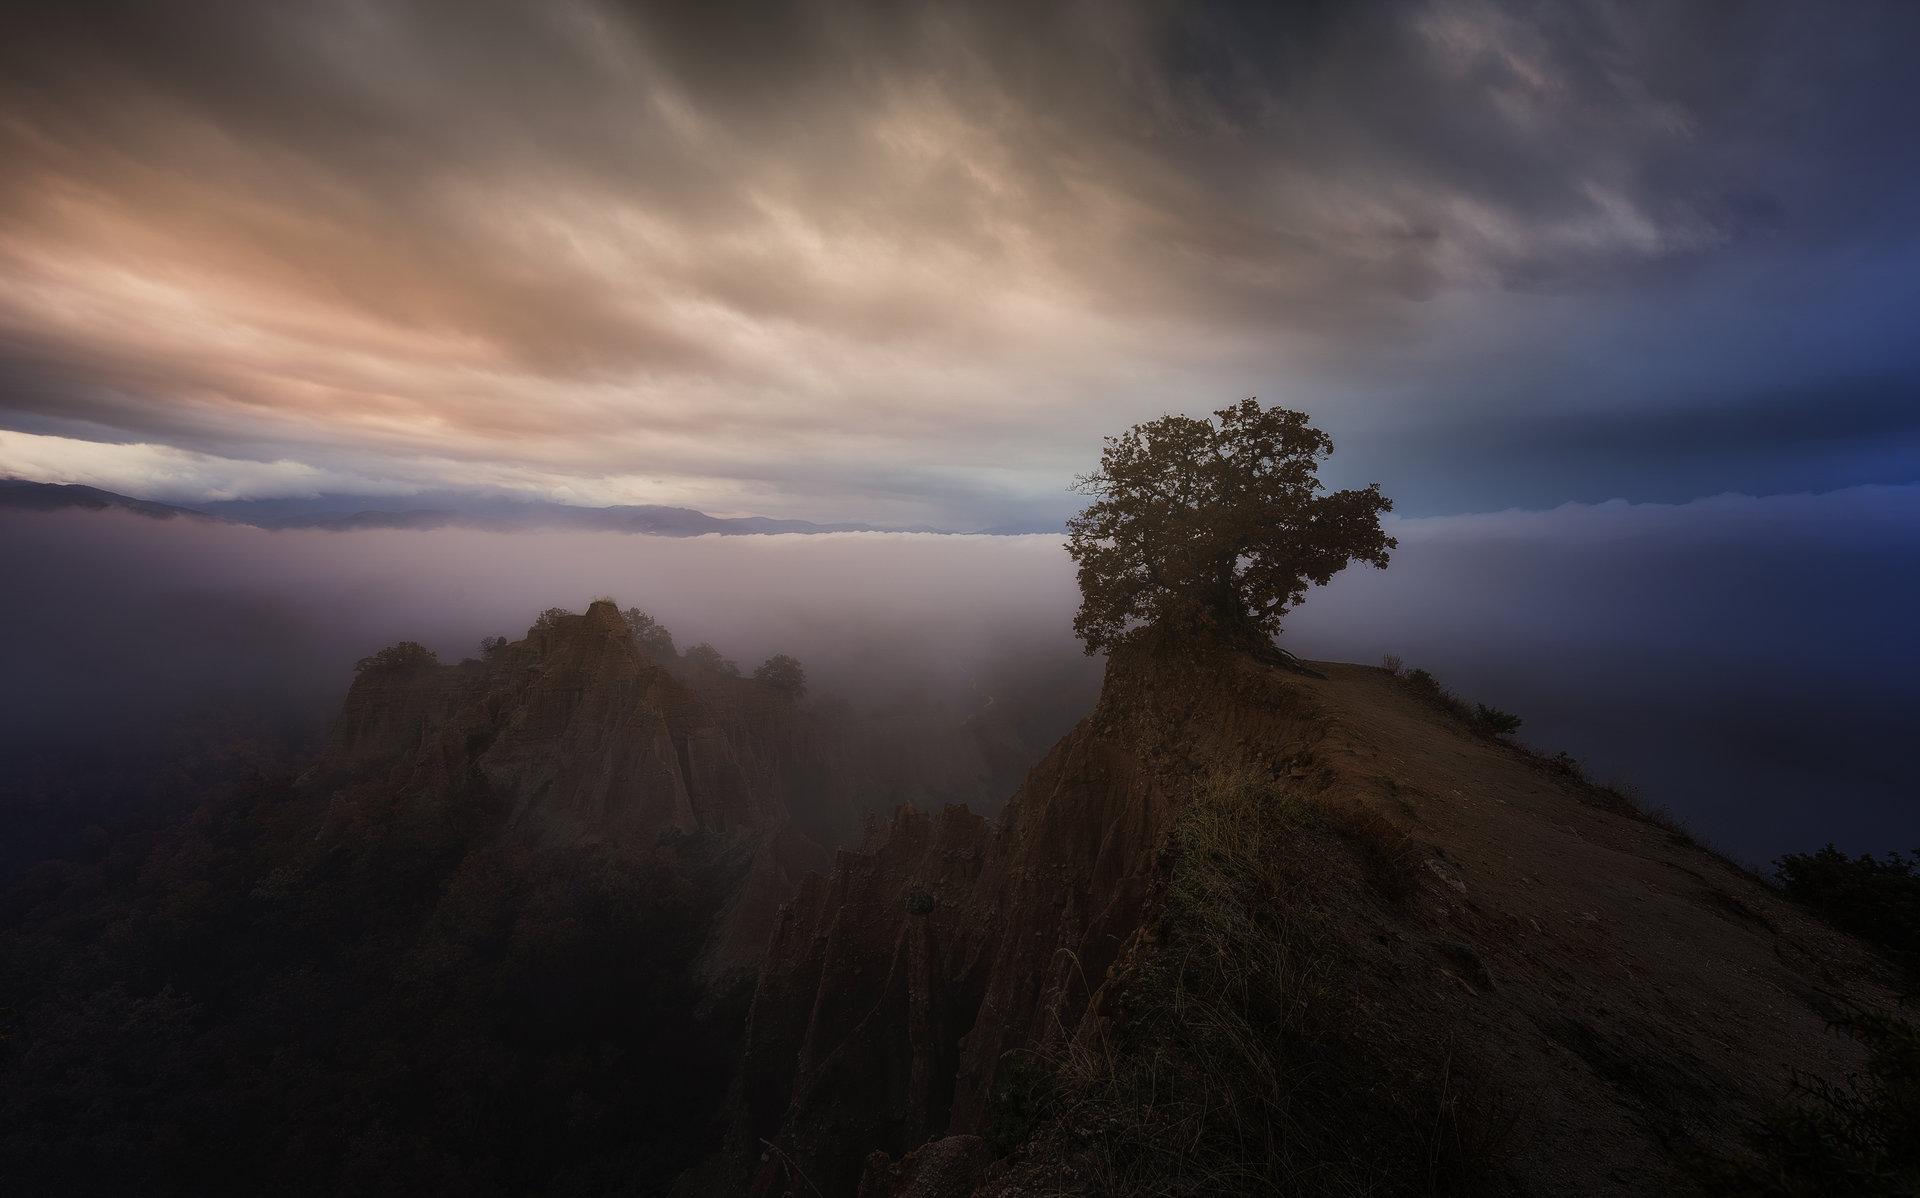 Photo in Landscape | Author Lyubomir Momchilov - Liubendy | PHOTO FORUM